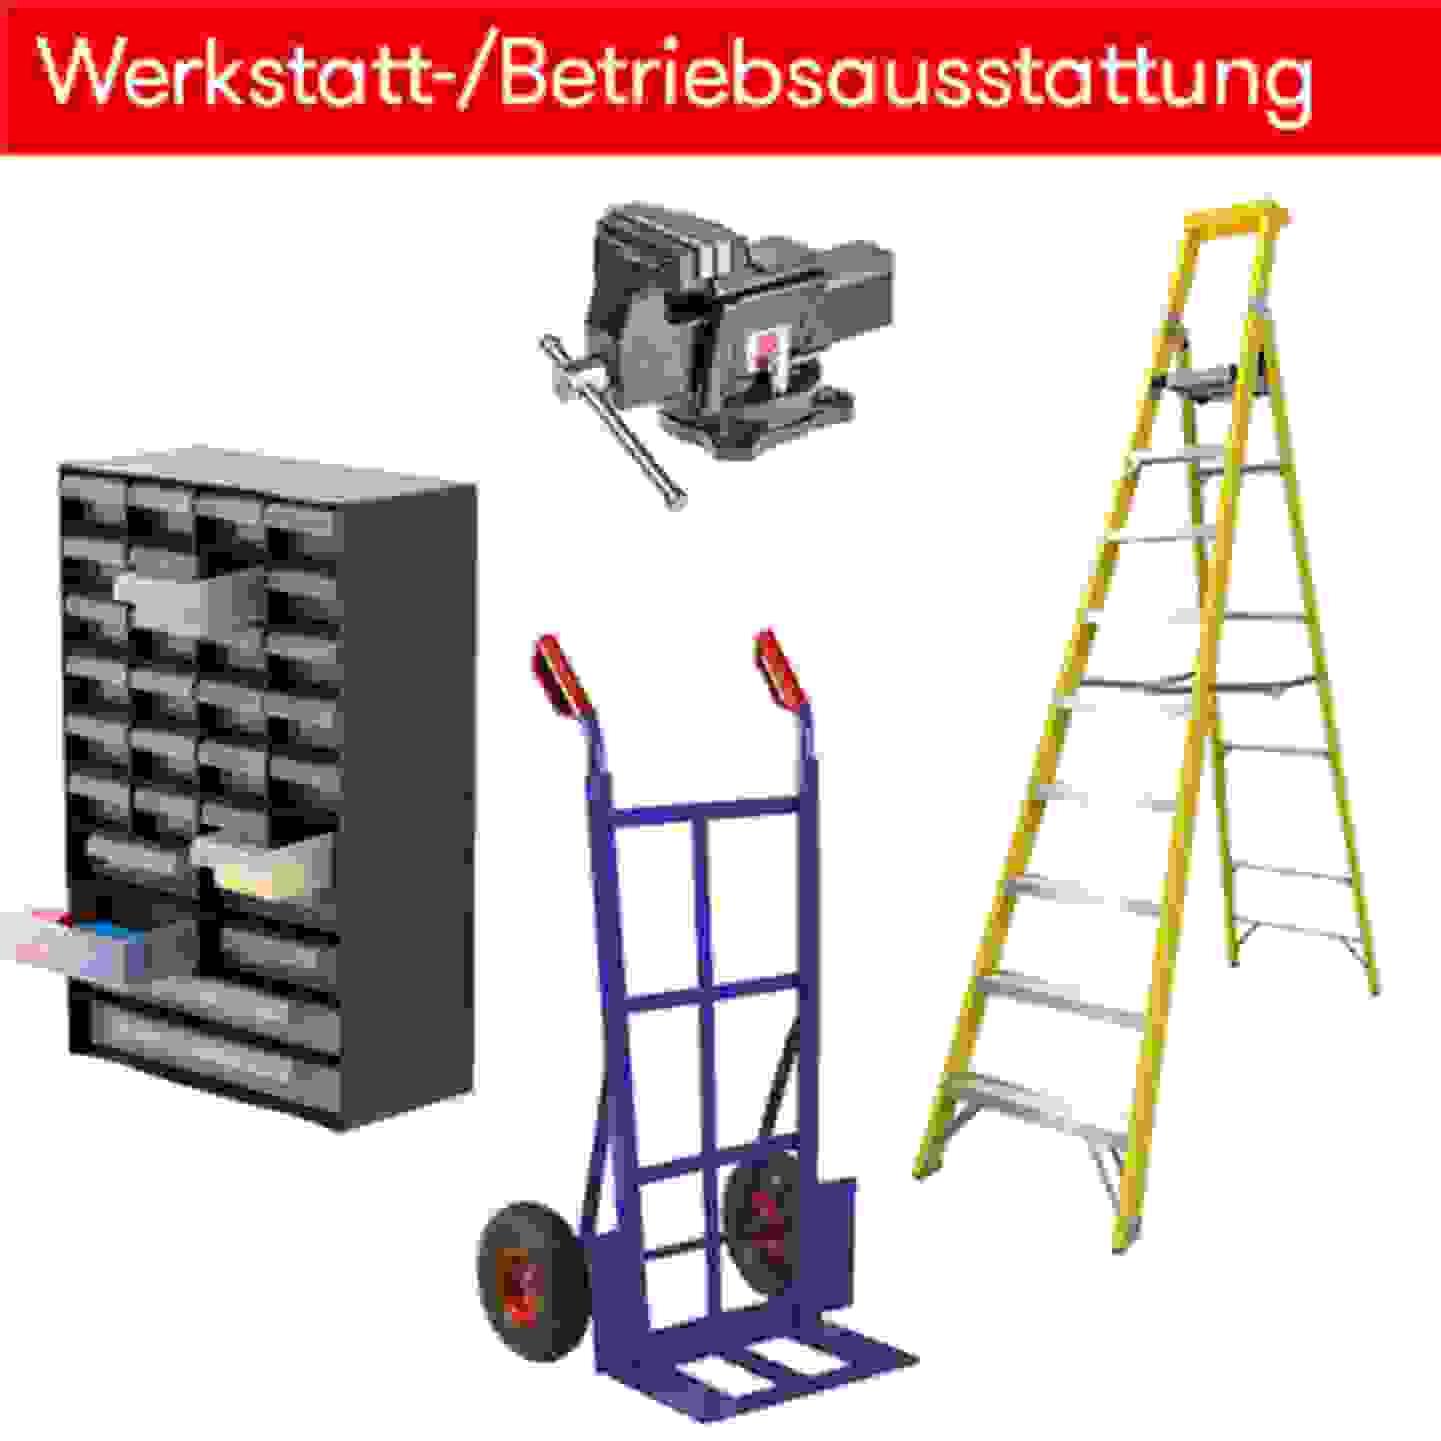 Werkstatt-/Betriebsausstattung